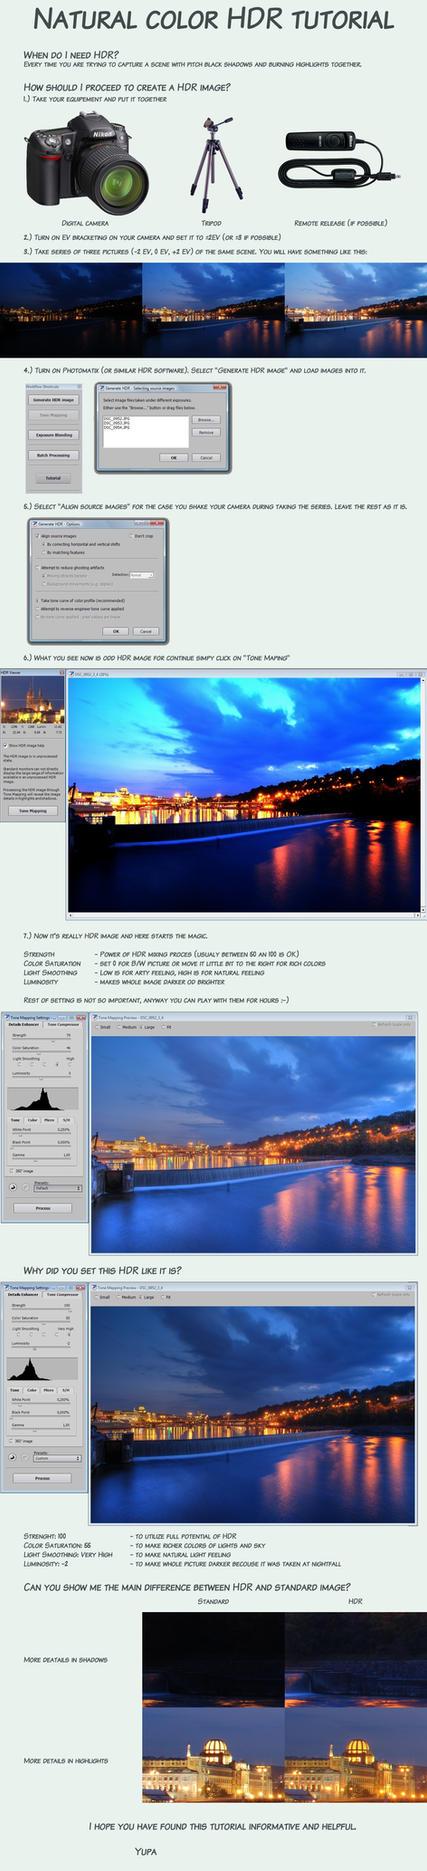 Natural color HDR tutorial by Yupa